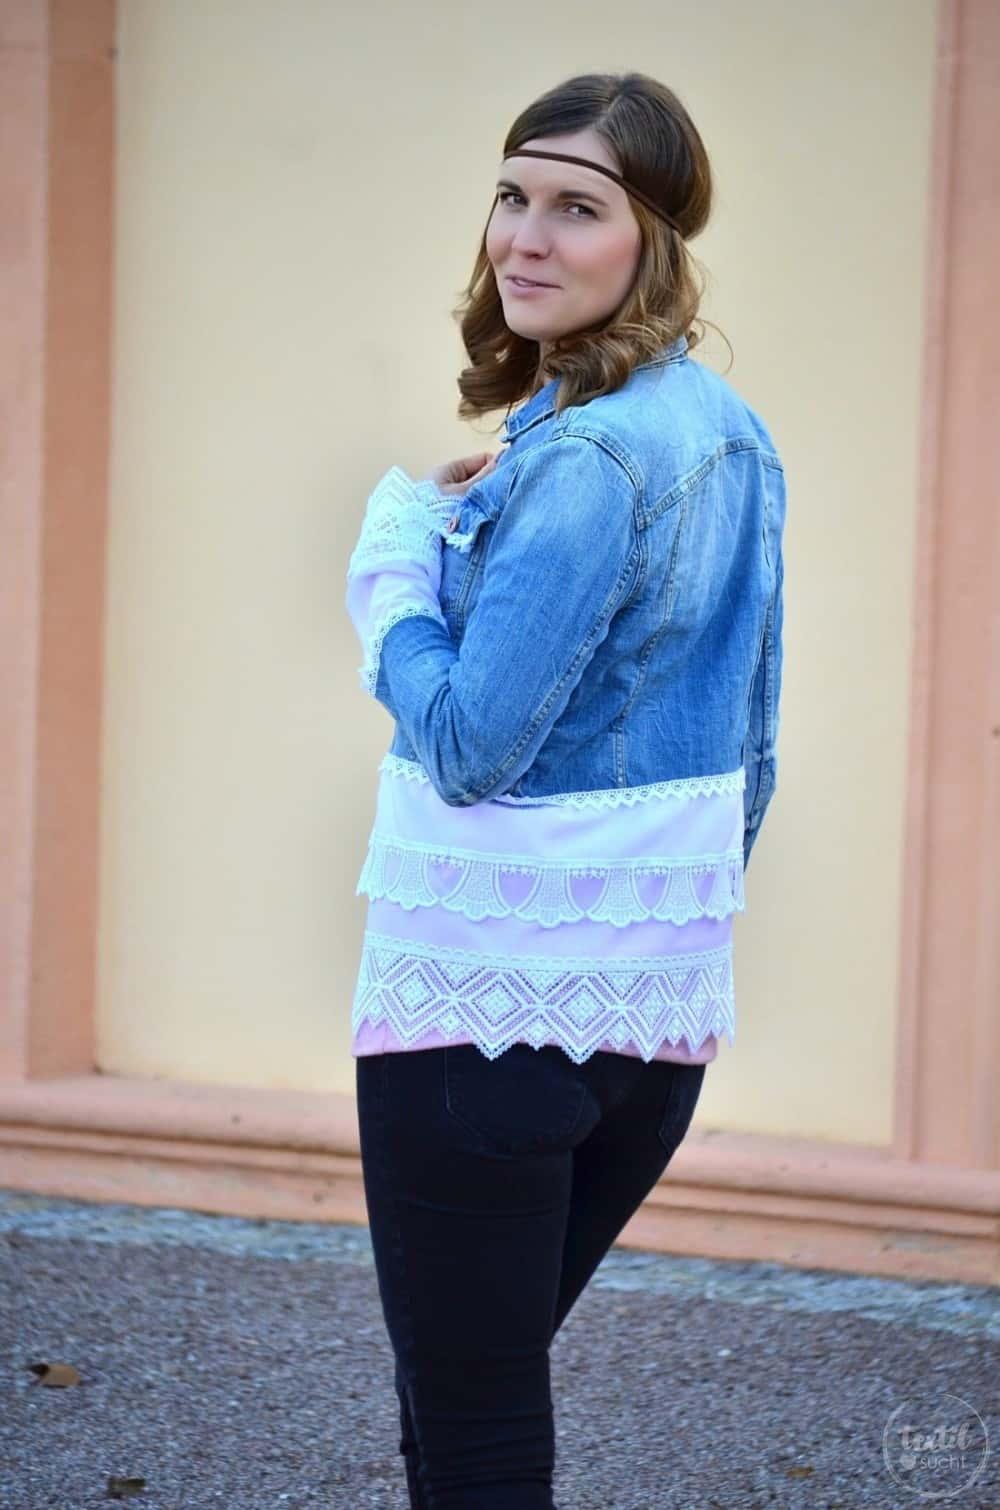 Tutorial: Jeansjacke Upcycling - Die fertige Jacke - Bild 5 | textilsucht.de